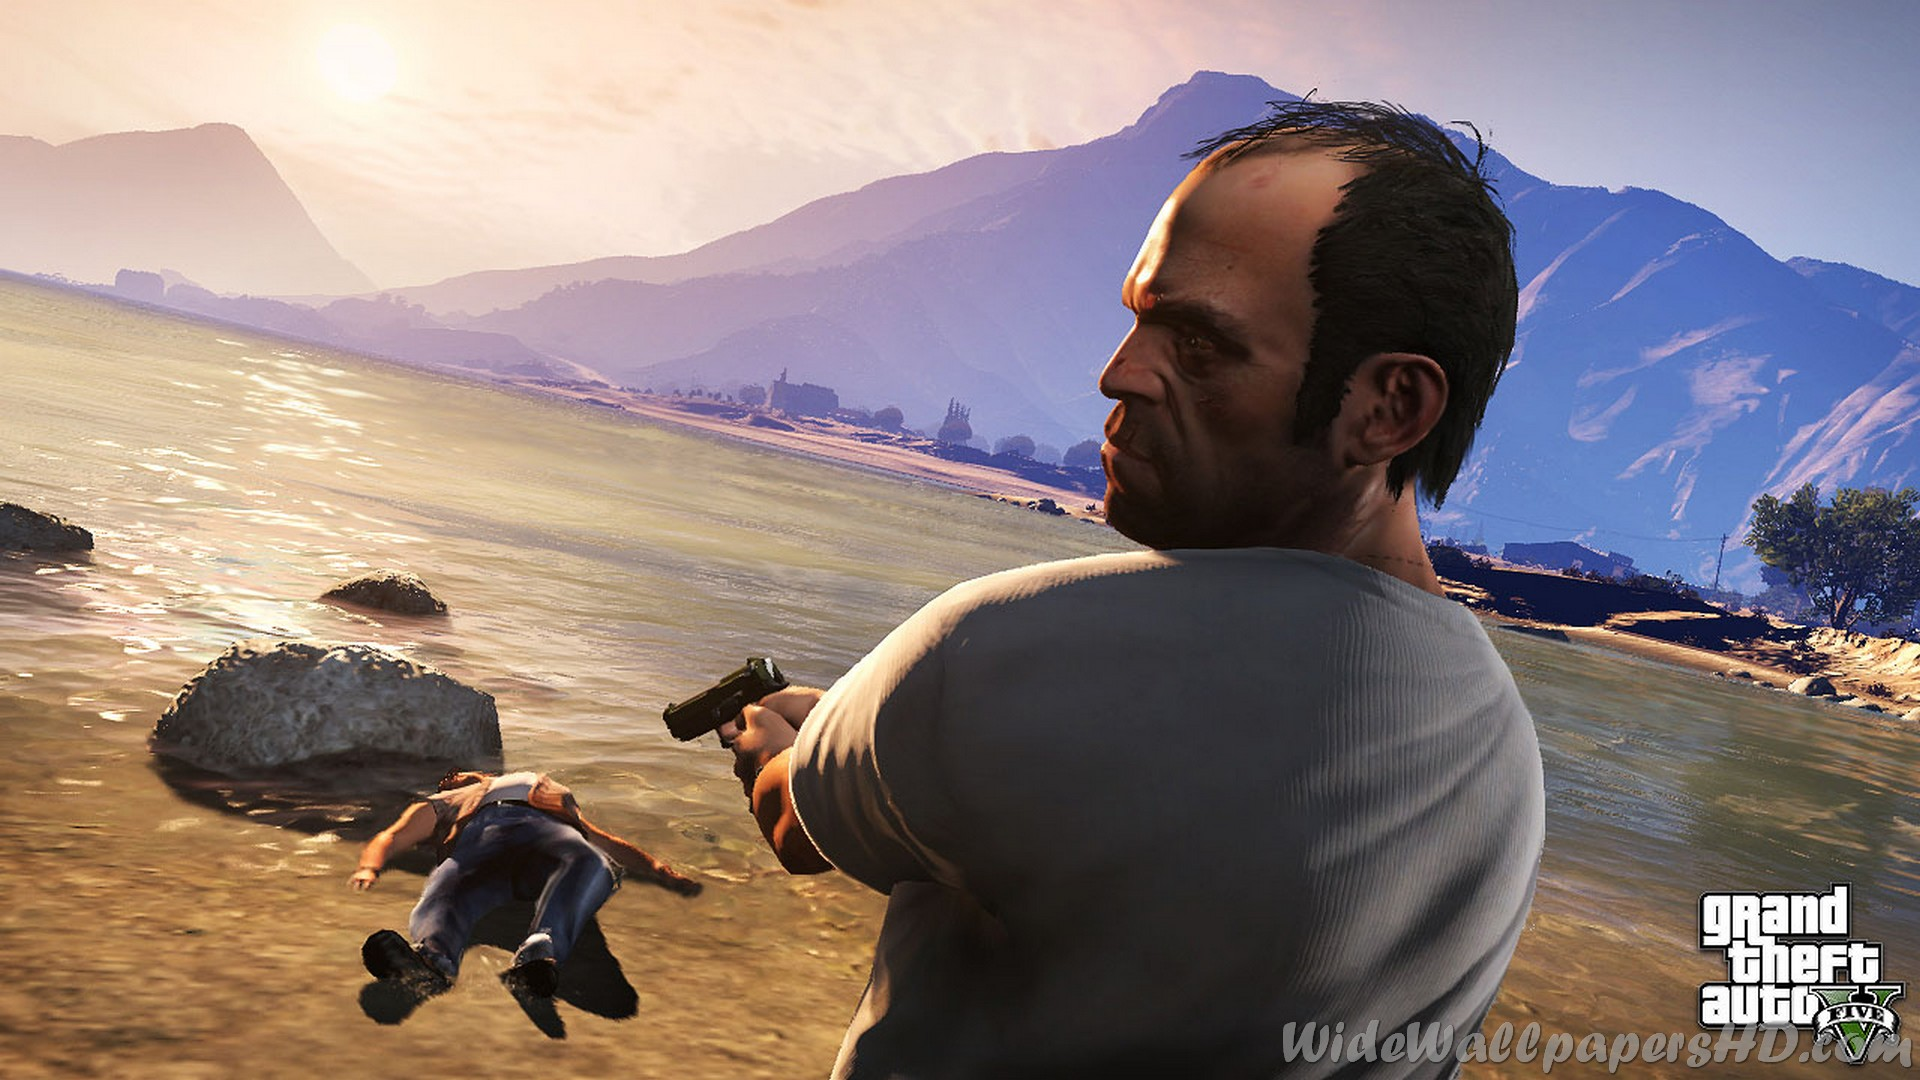 Grand Theft Auto V Wallpaper - Gta Online , HD Wallpaper & Backgrounds